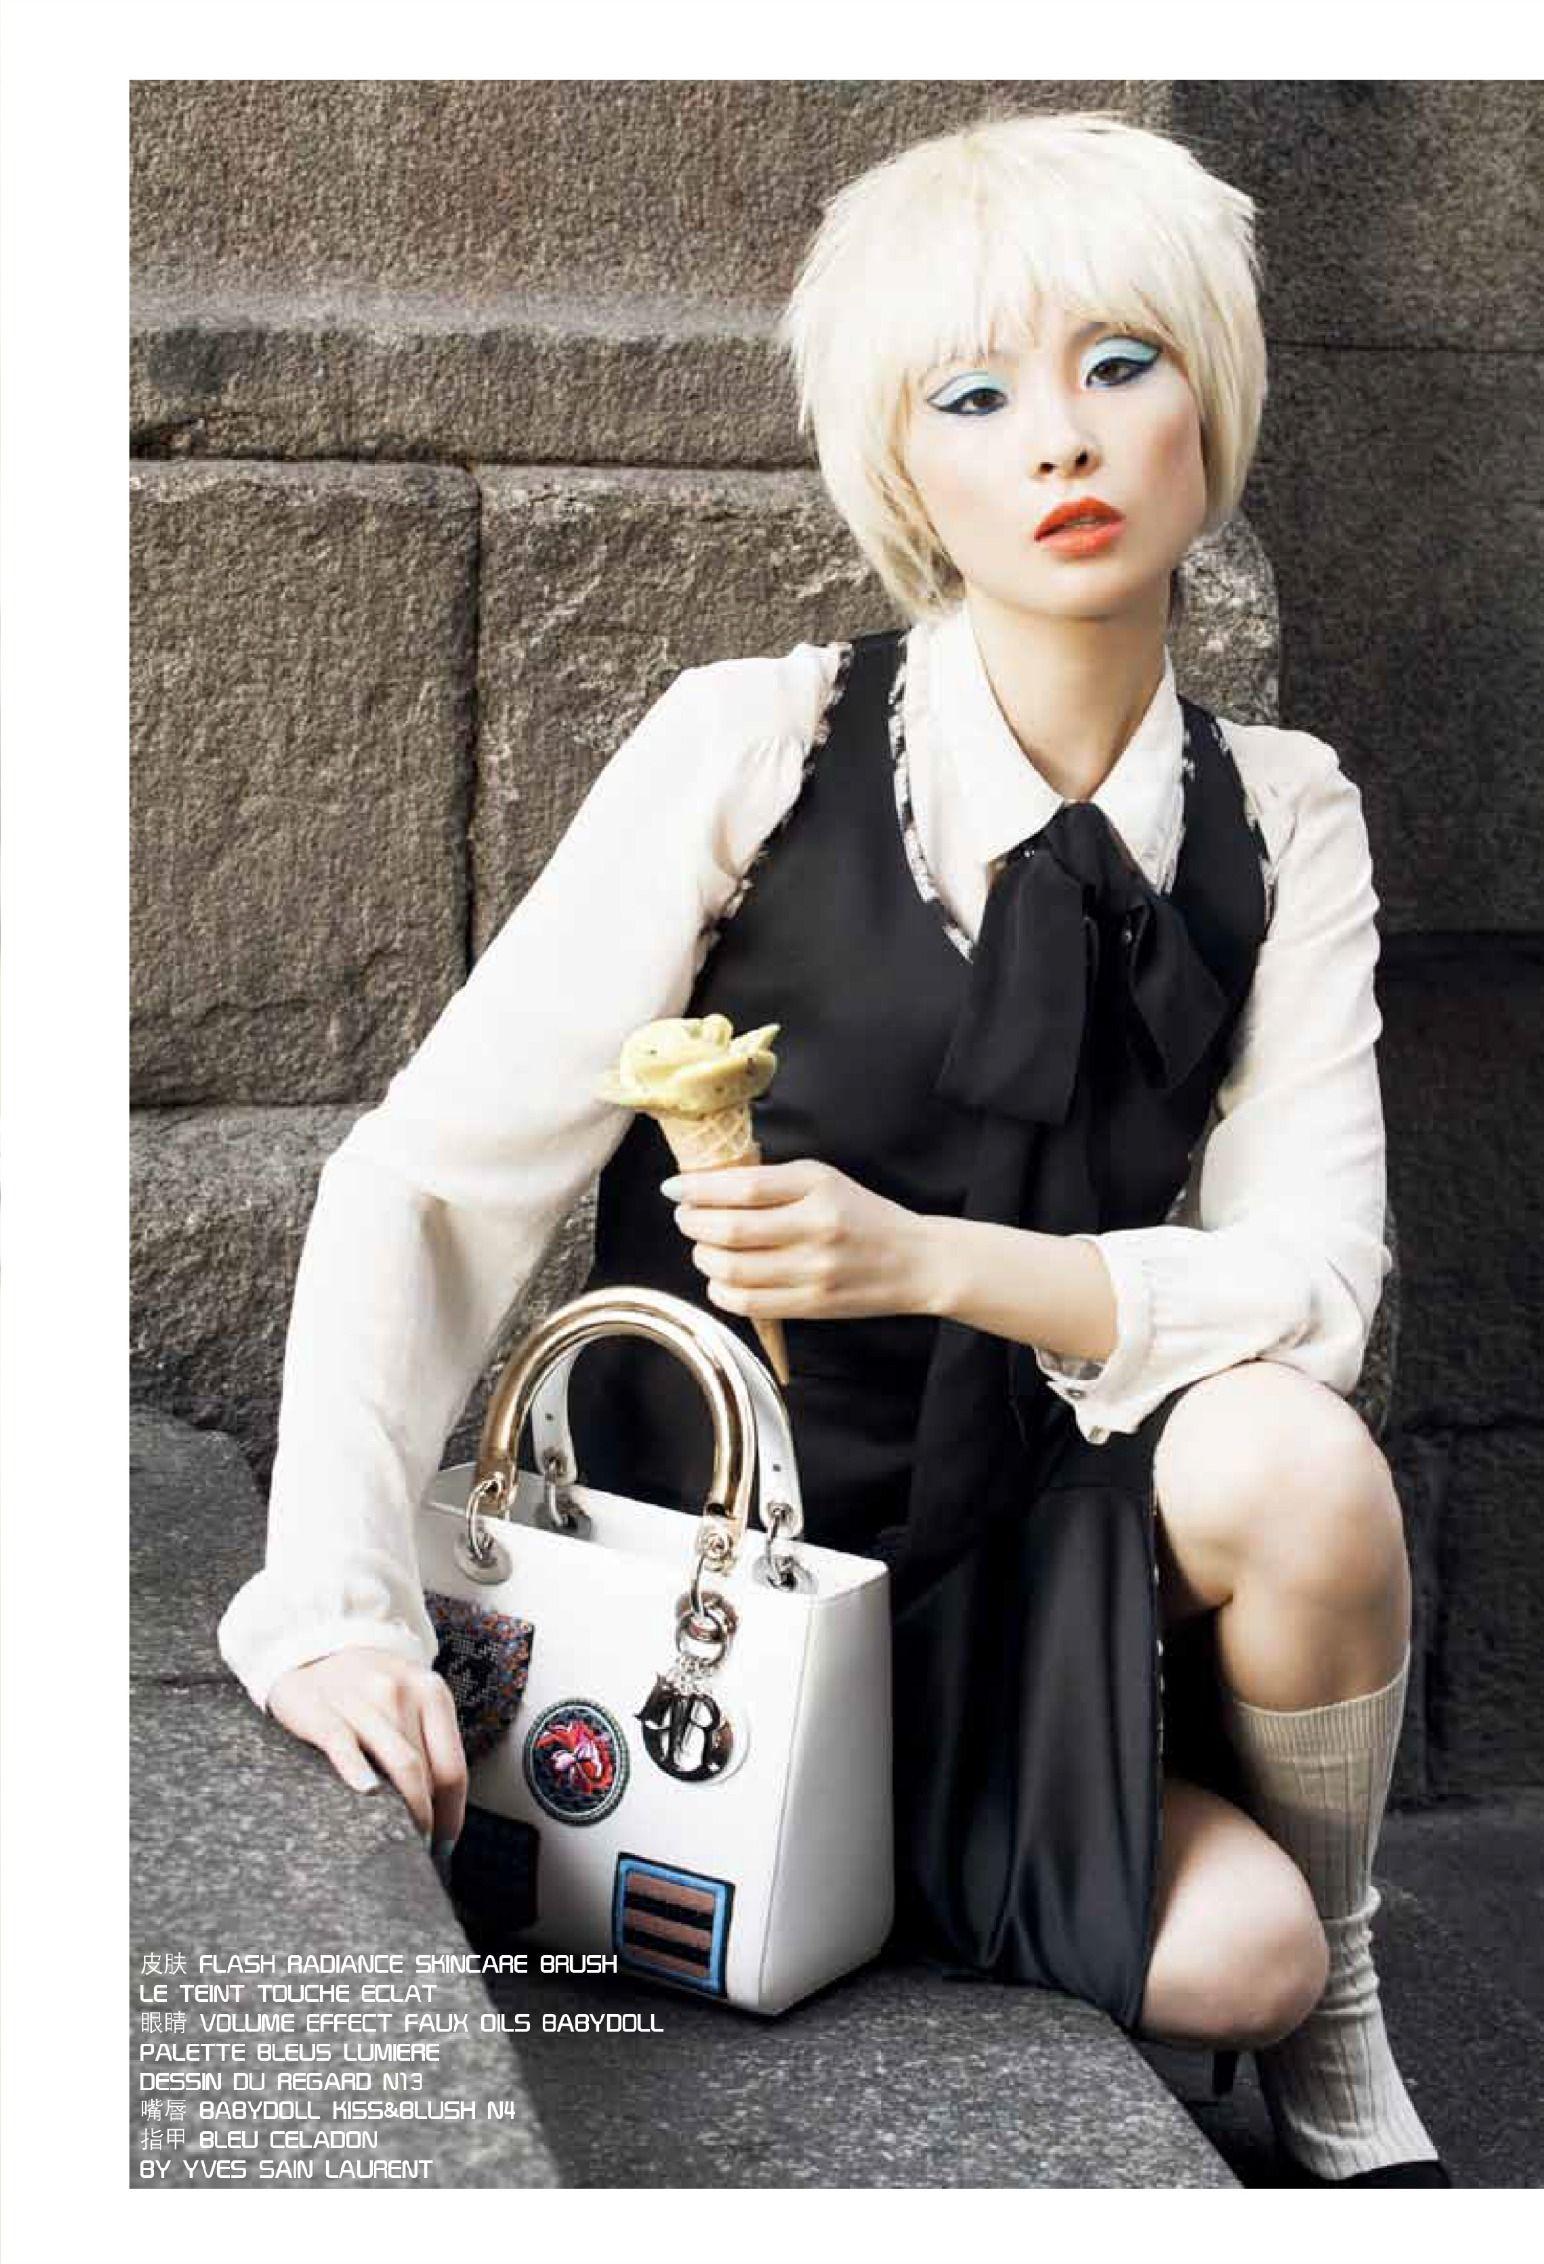 Amorino en Avenue Illustrated China (nº6). #PressCoverage #Clipping #Magazine #Fashion